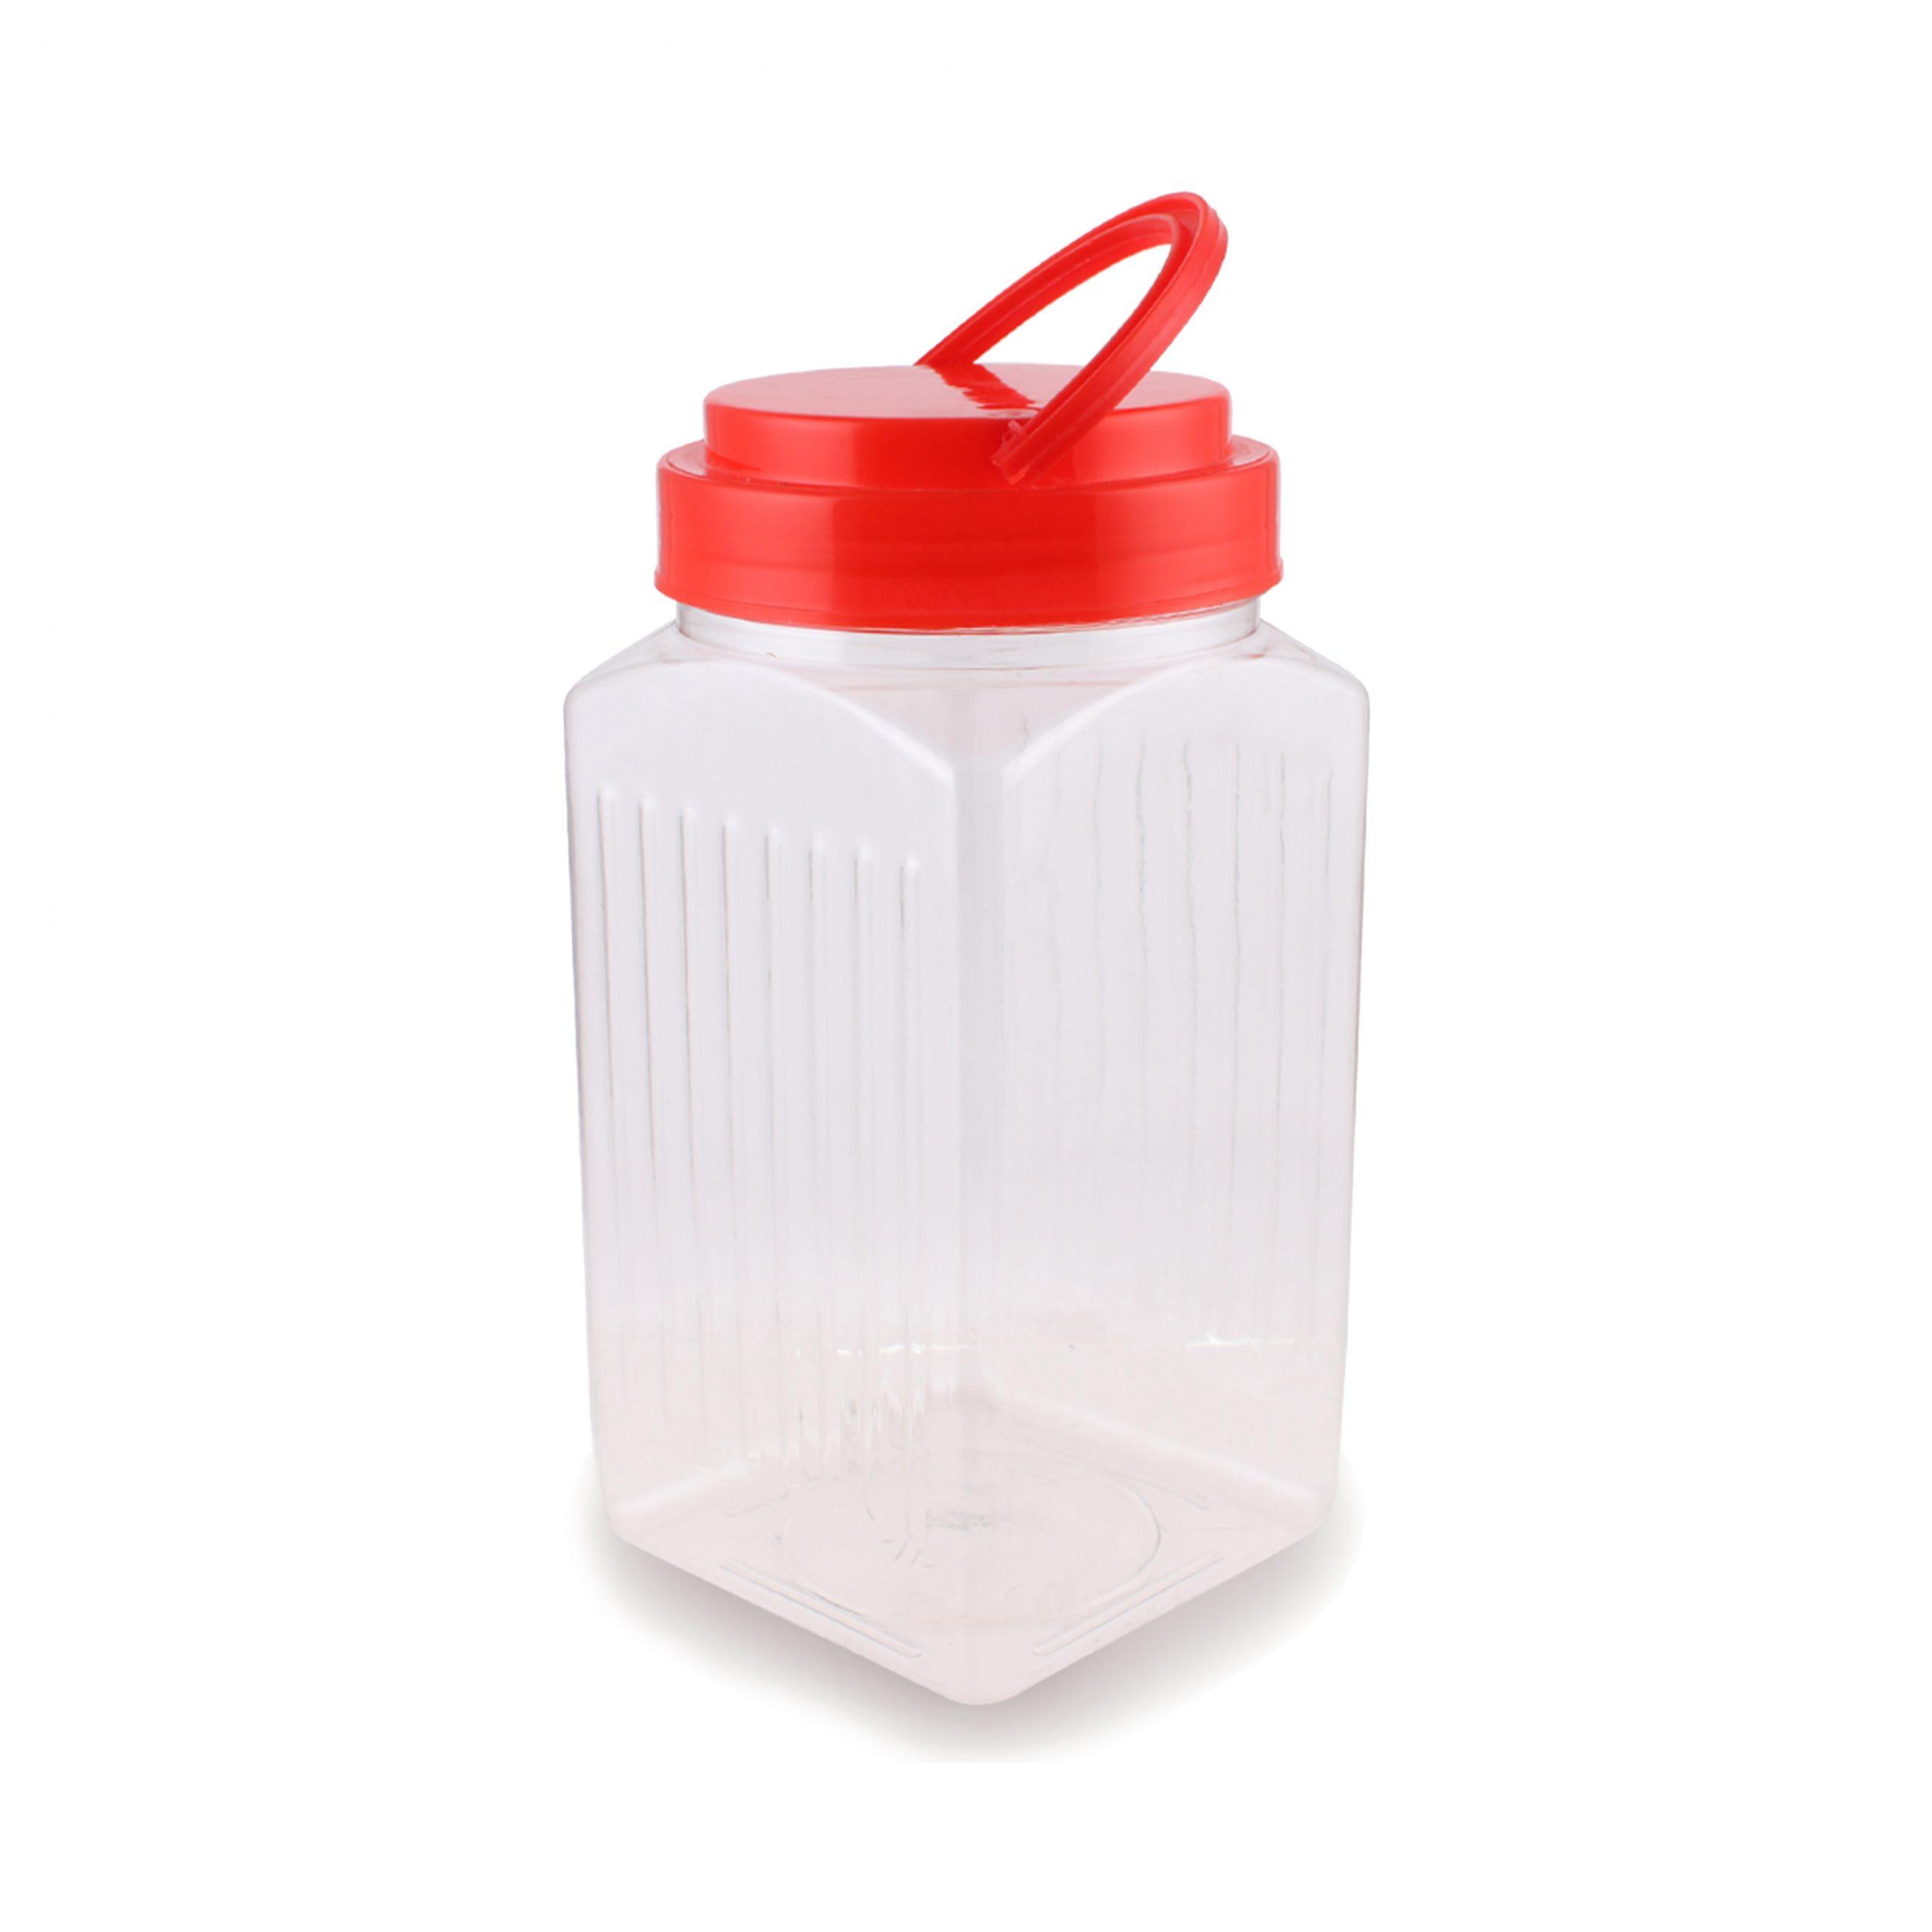 Toko Grosir Plastik PET Surabaya - Toples Kotak 1 Kg